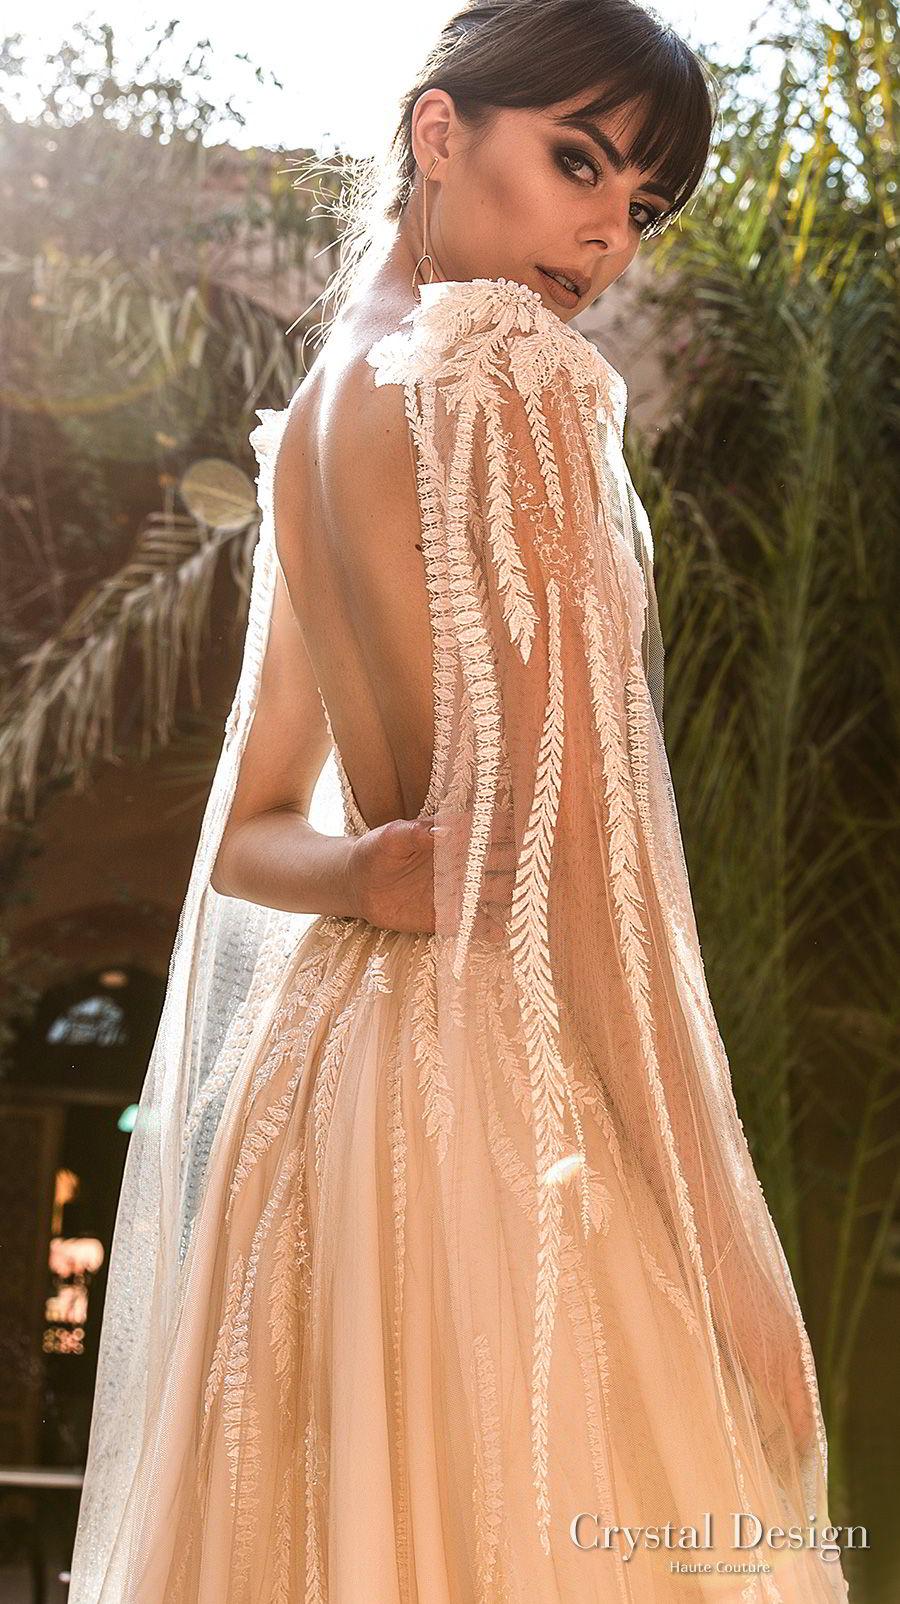 crystal design 2018 sleeveless bateau neck heavily embellished bodice romantic a line wedding dress cape open scoop back chapel train (elizion) zbv